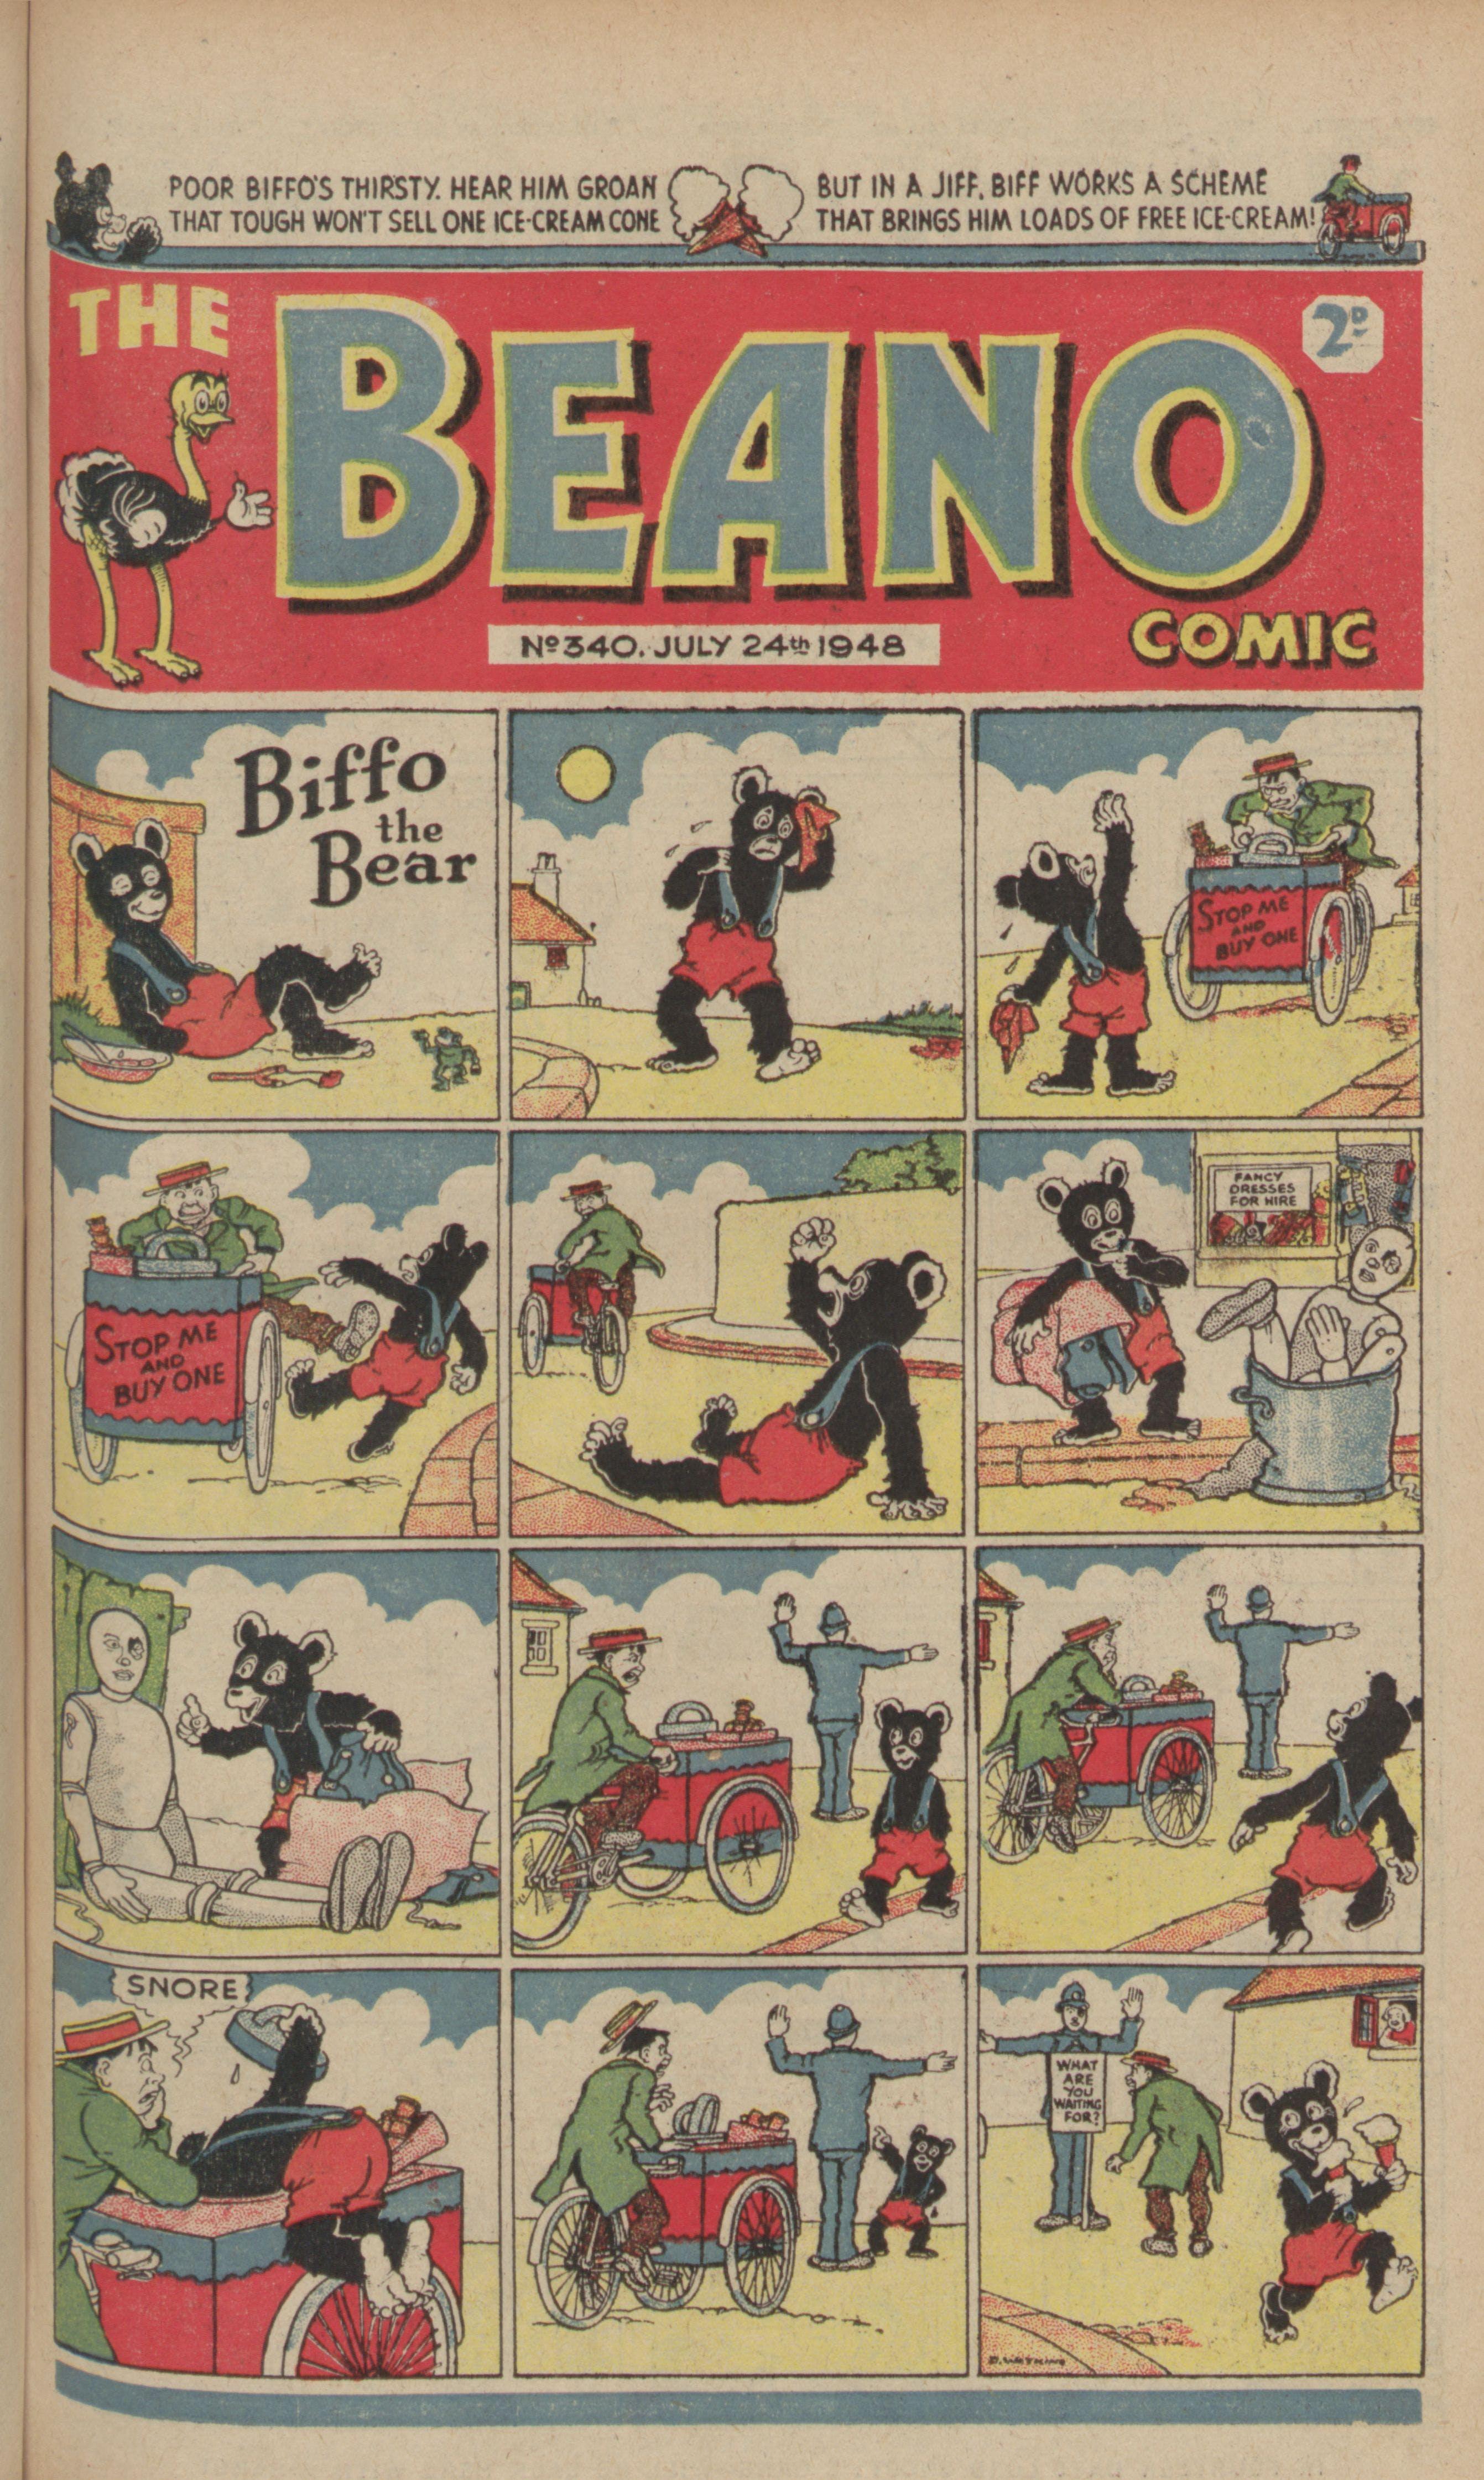 1948 beano cover